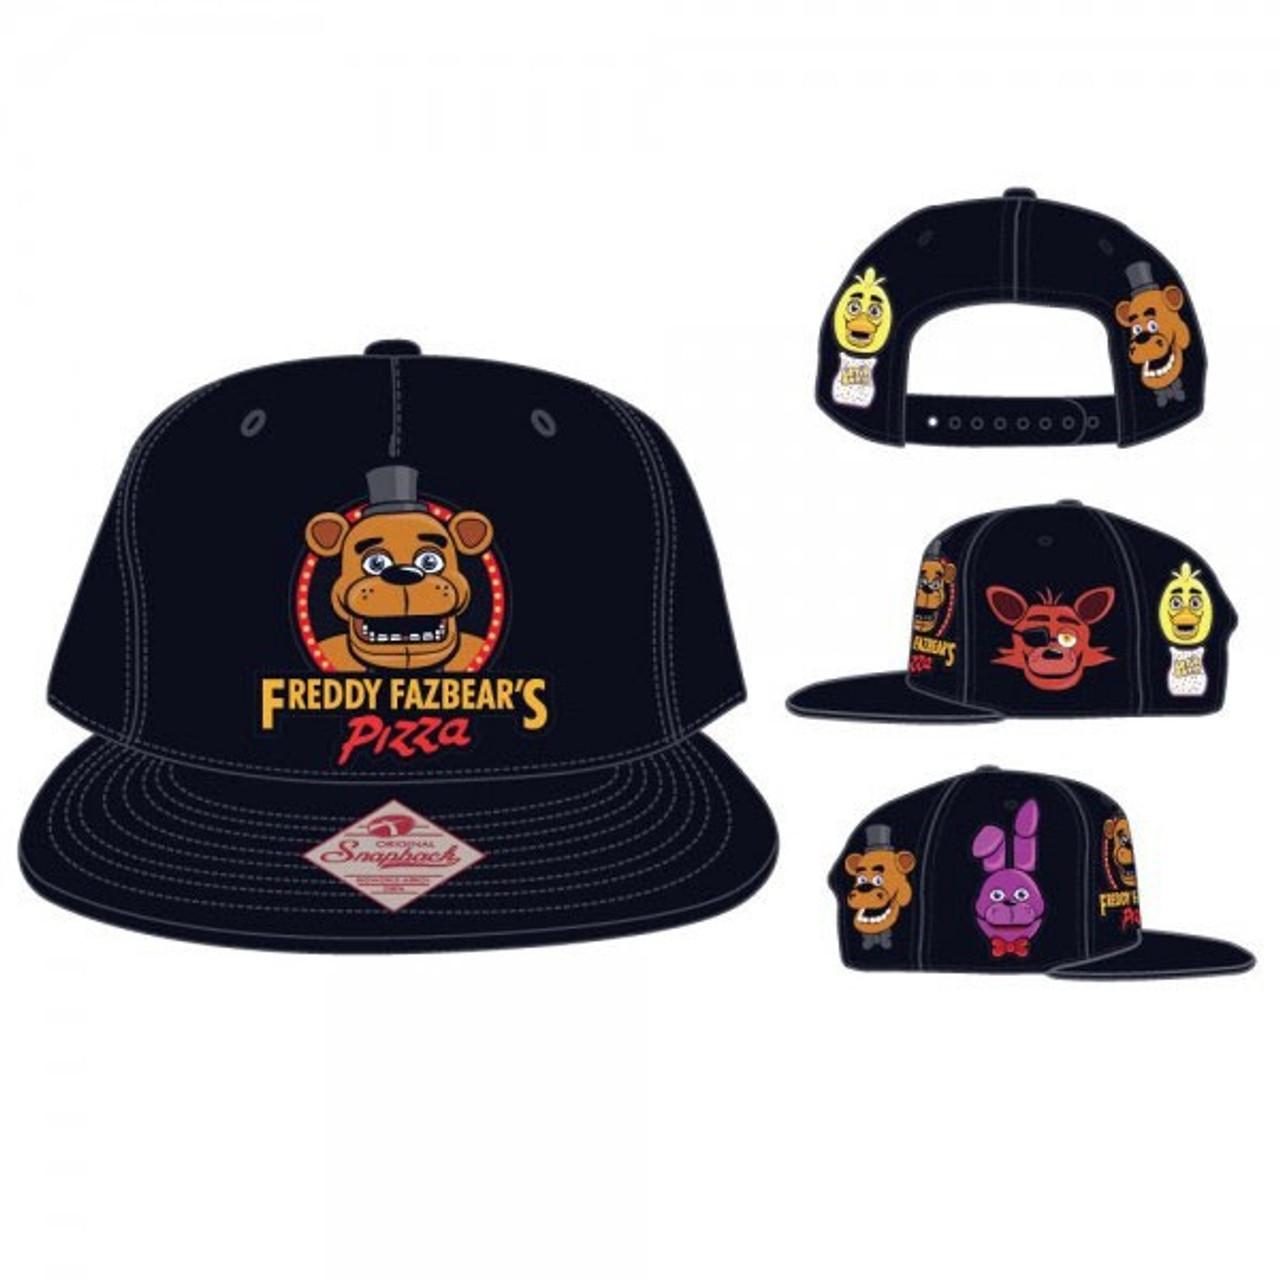 a3f6e047c9f Five Nights at Freddys Omni Color Snapback Cap Apparel Youth Size Bioworld  - ToyWiz